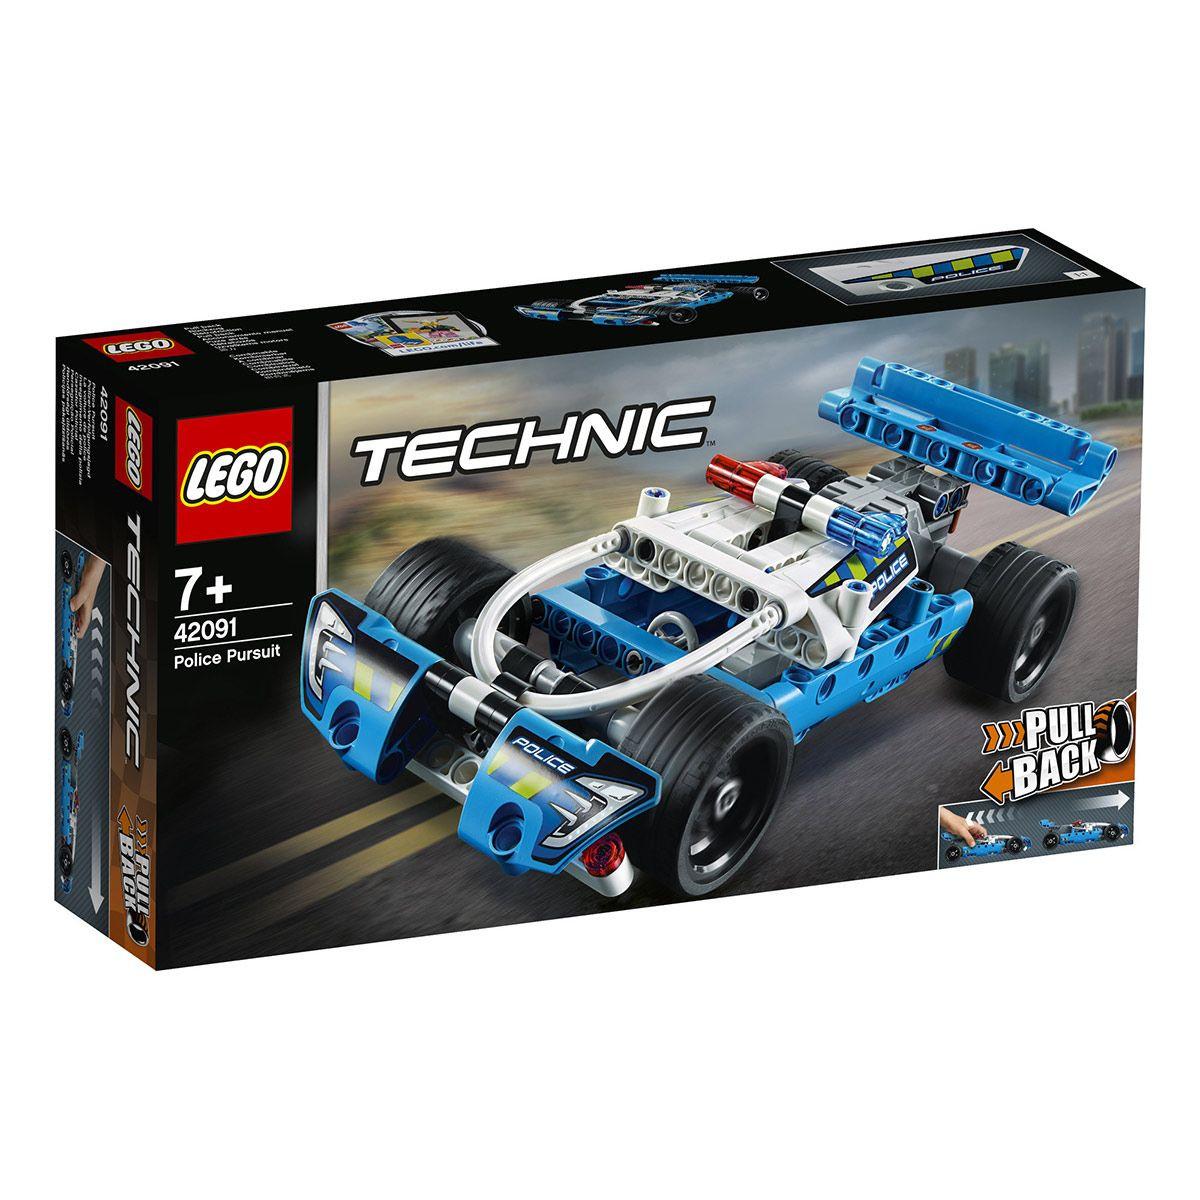 TECHNIC -  POLICE PURSUIT (120 PIECES) 42091